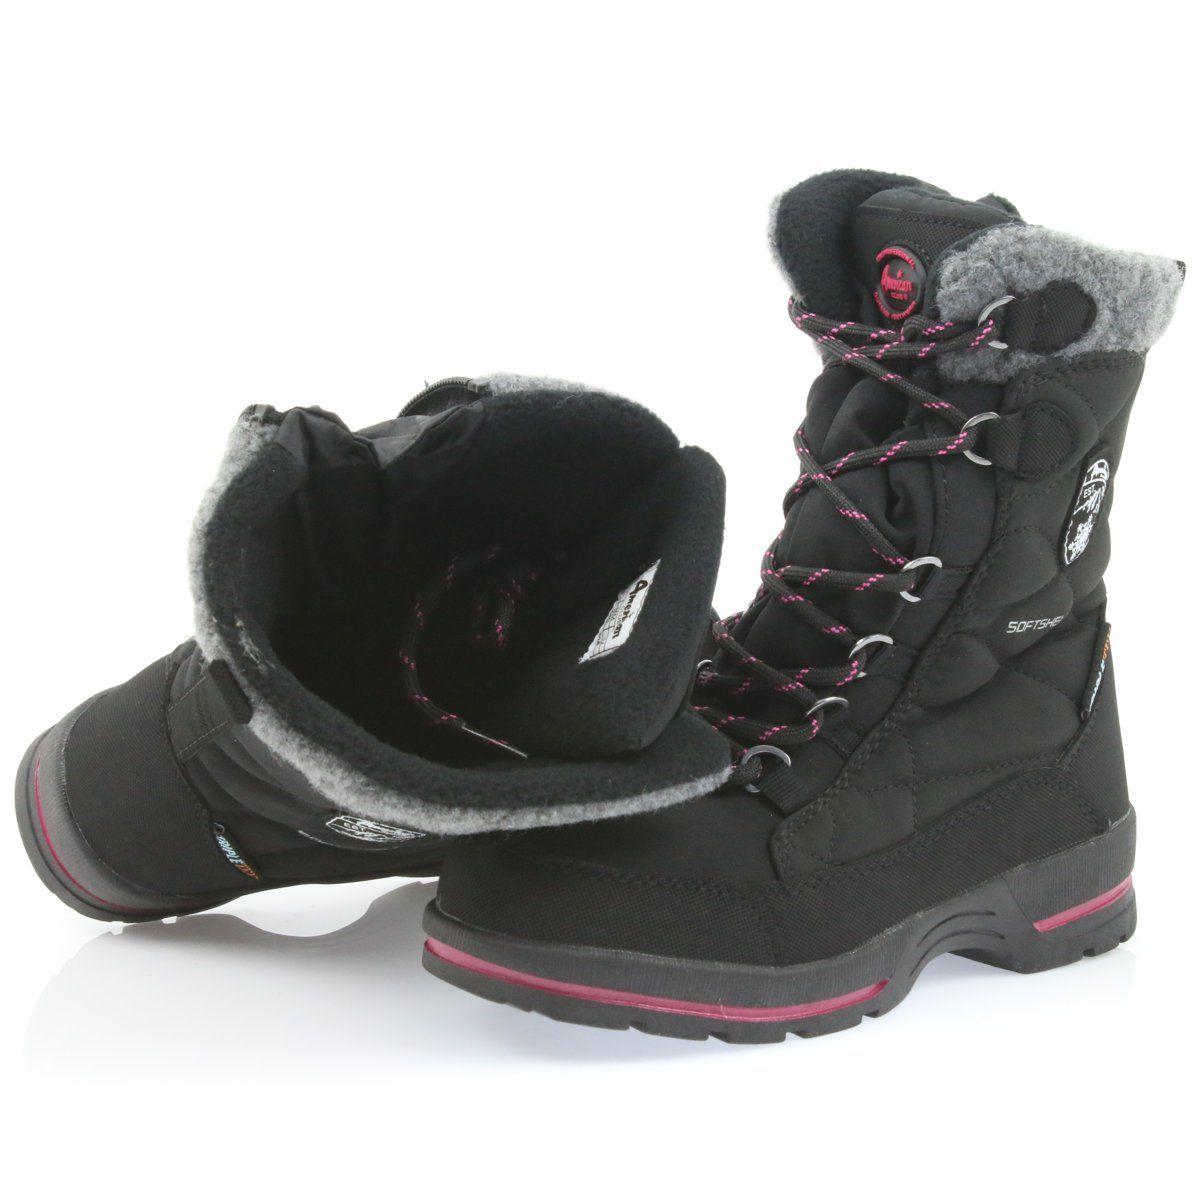 American Club Sniegowce Softshell Z Membrana American Sn19 20 Czarne Rozowe Szare Boots Shoes Winter Boot